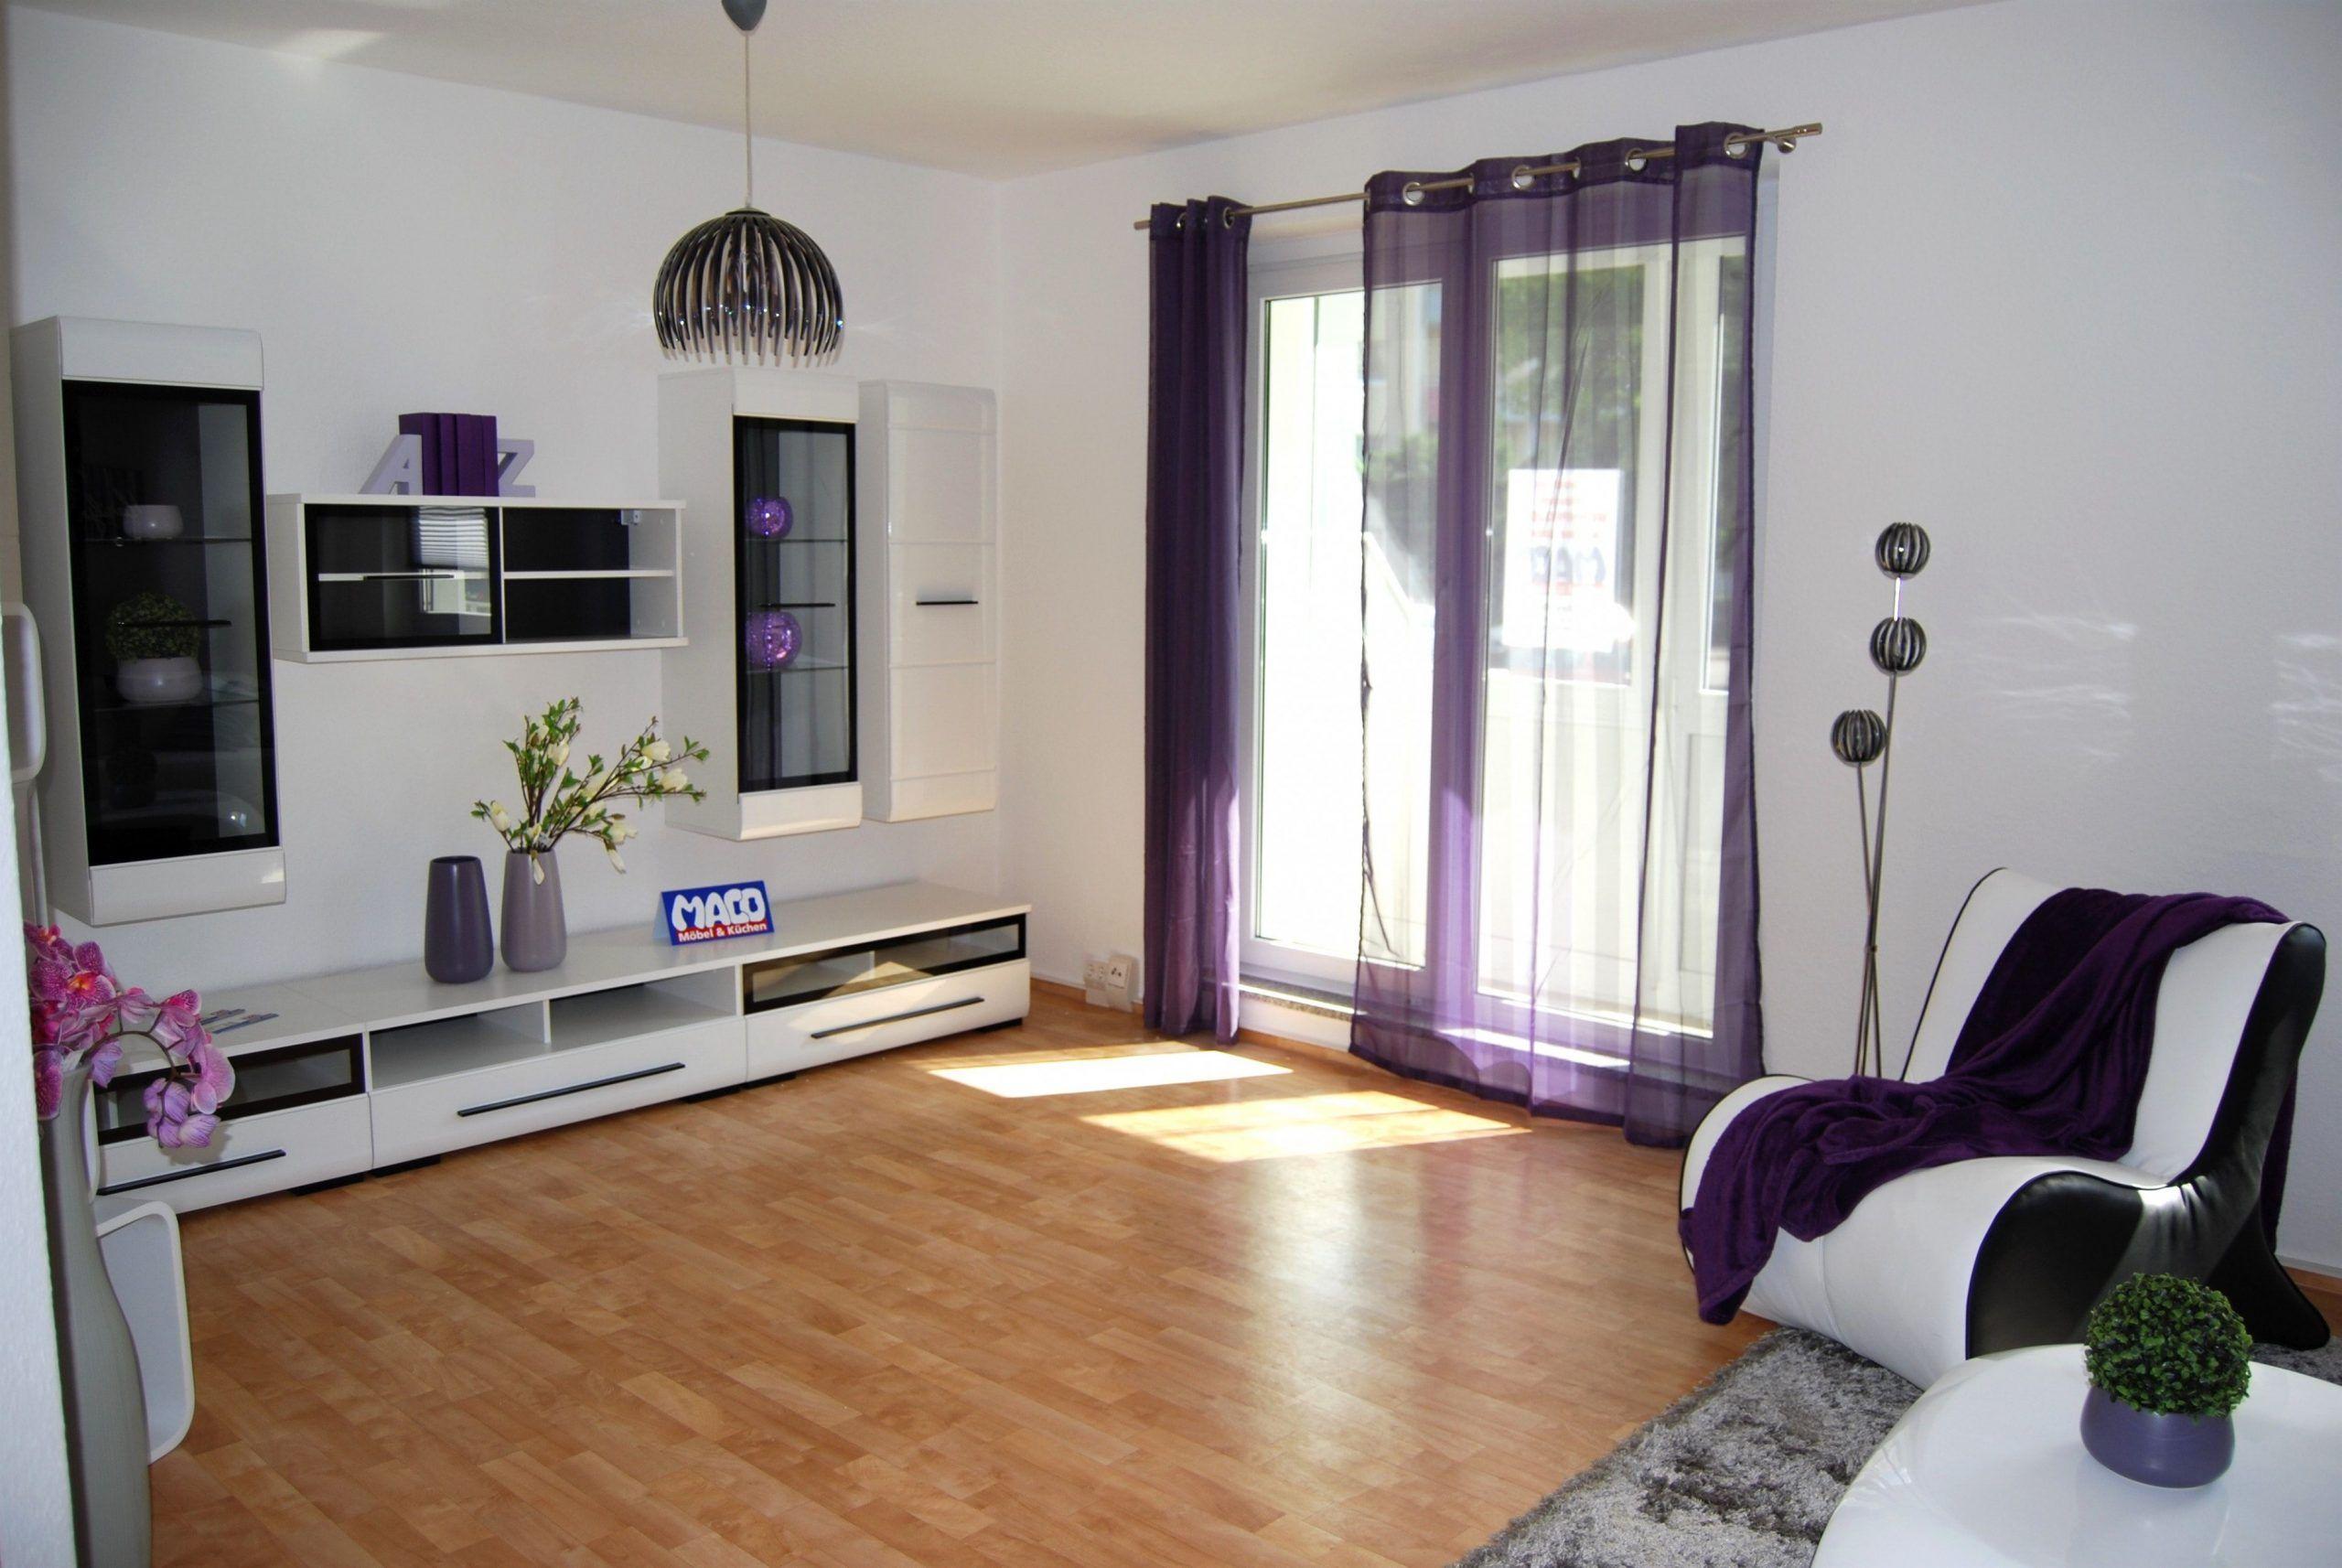 8 Wohnzimmer Ideen 8 Qm di 8